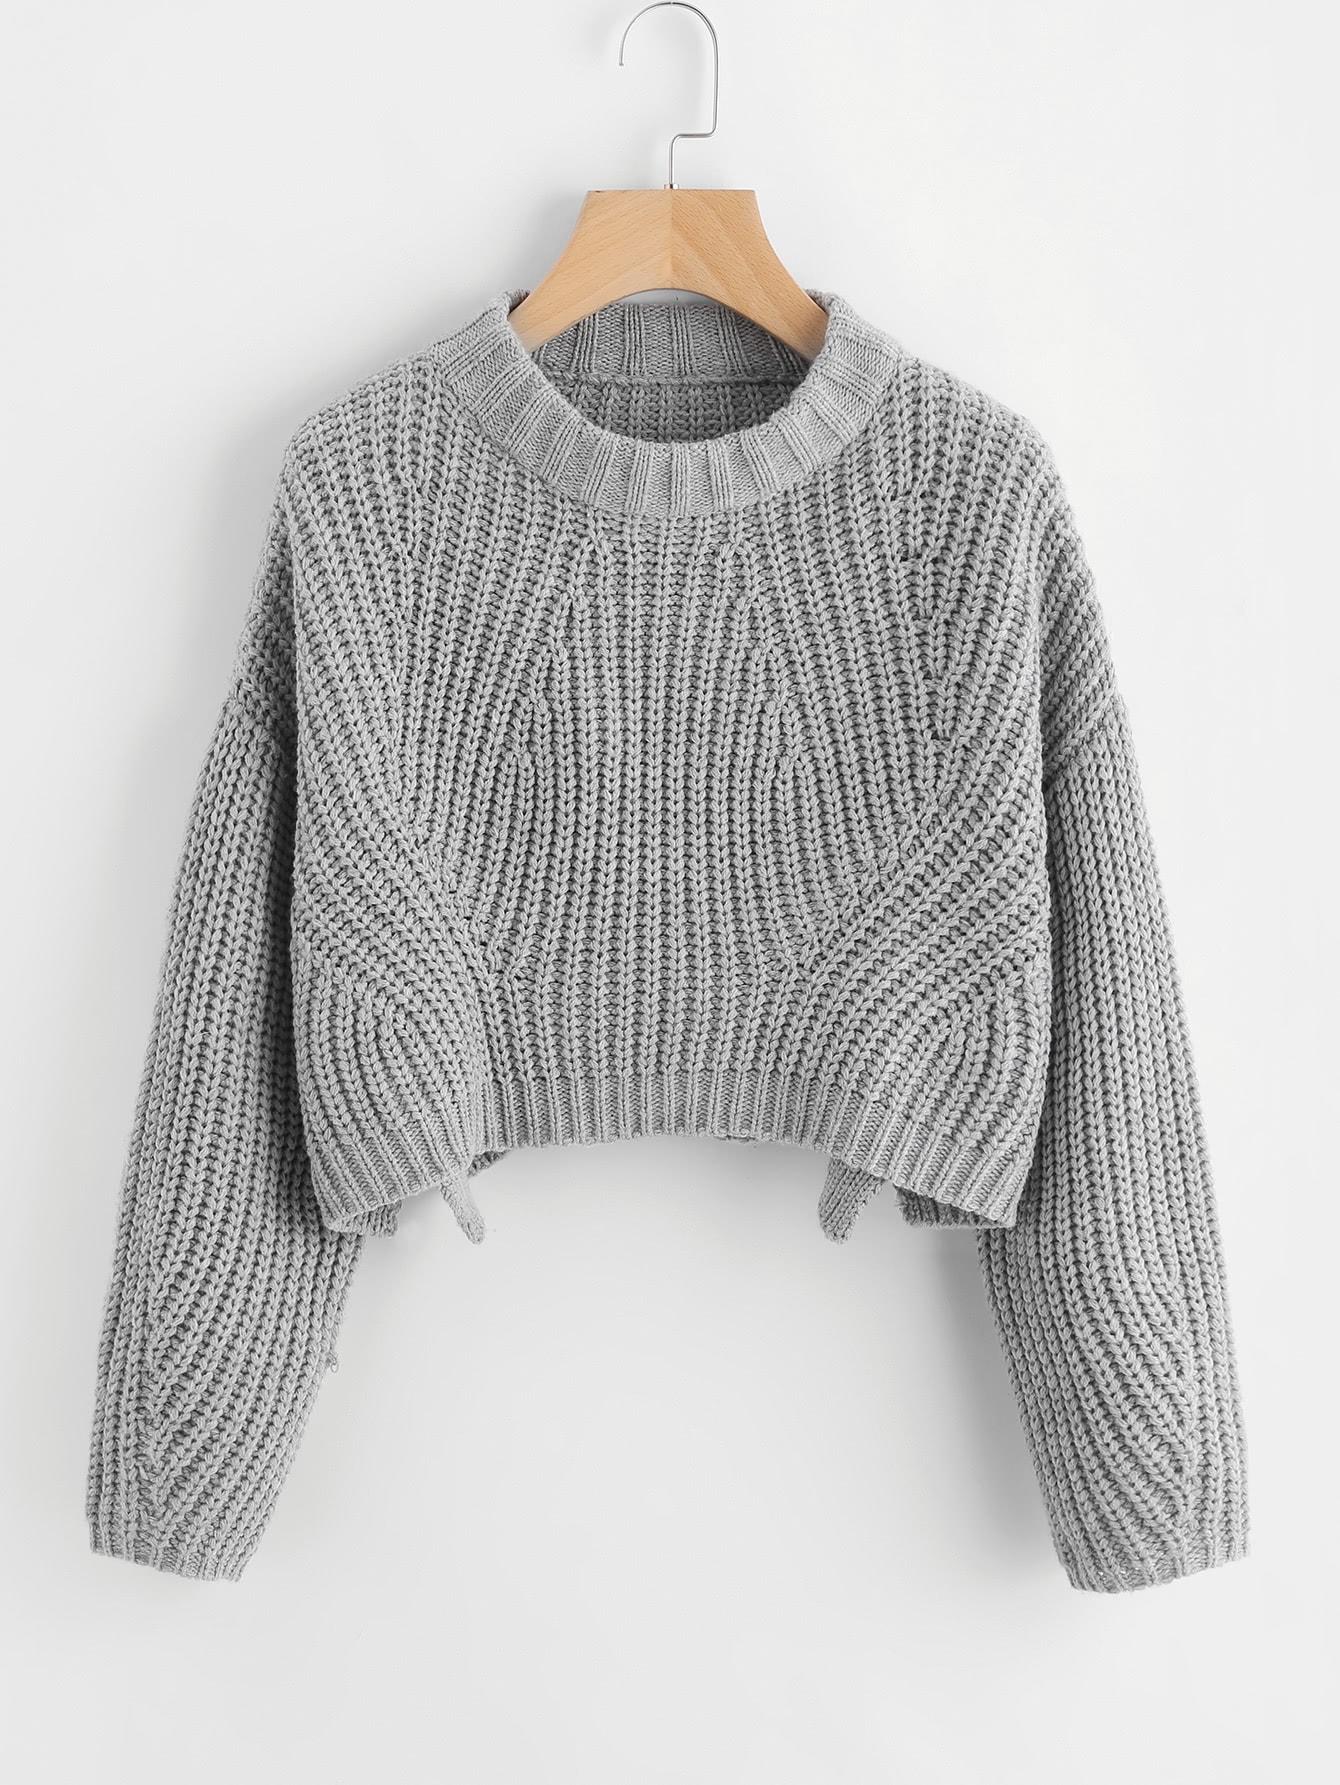 Vented Hem Chunky Knit Crop Jumper cable knit raw cut stepped hem jumper